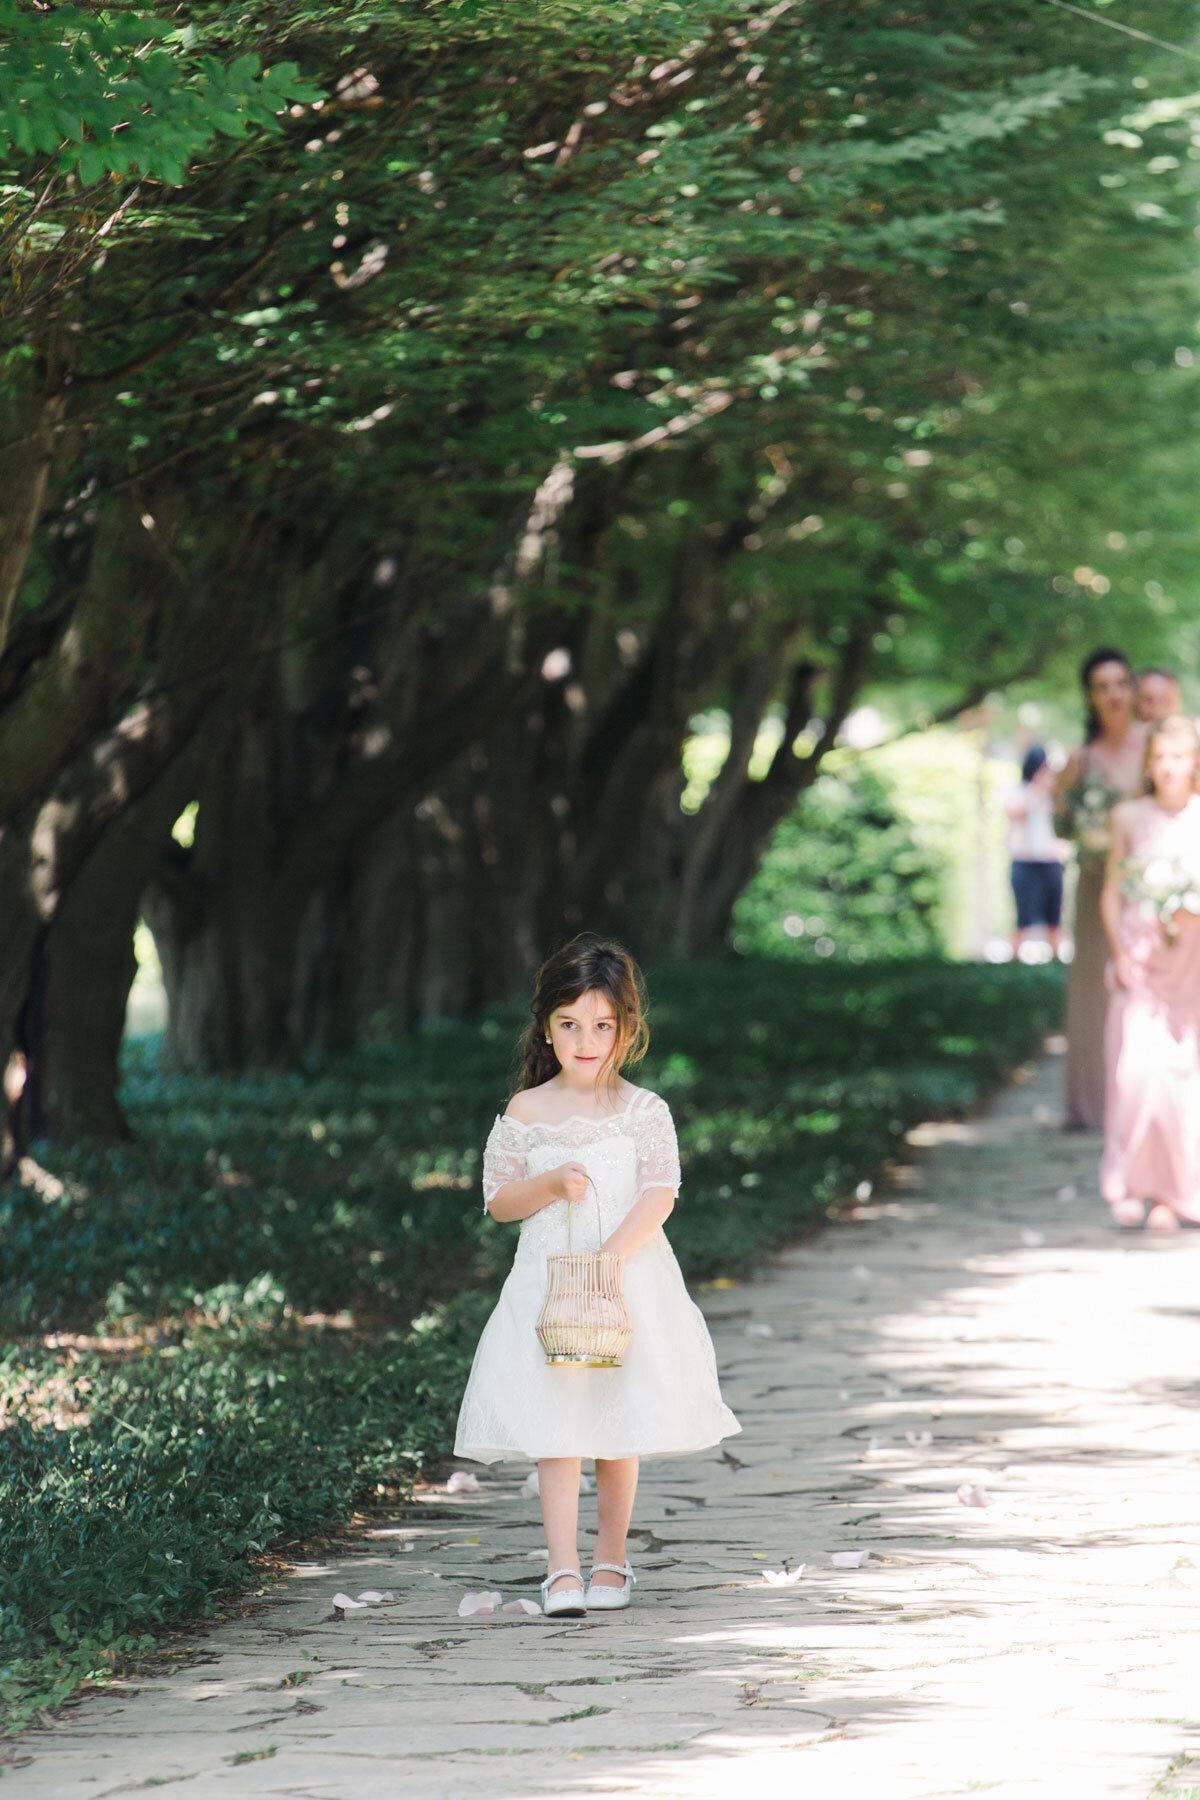 Chateau-des-Charmes-Wedding-Summer-Vineyard-Bride-Niagara-on-the-Lake-photos-by-Gemini-Photography-Ontario-0013.jpg